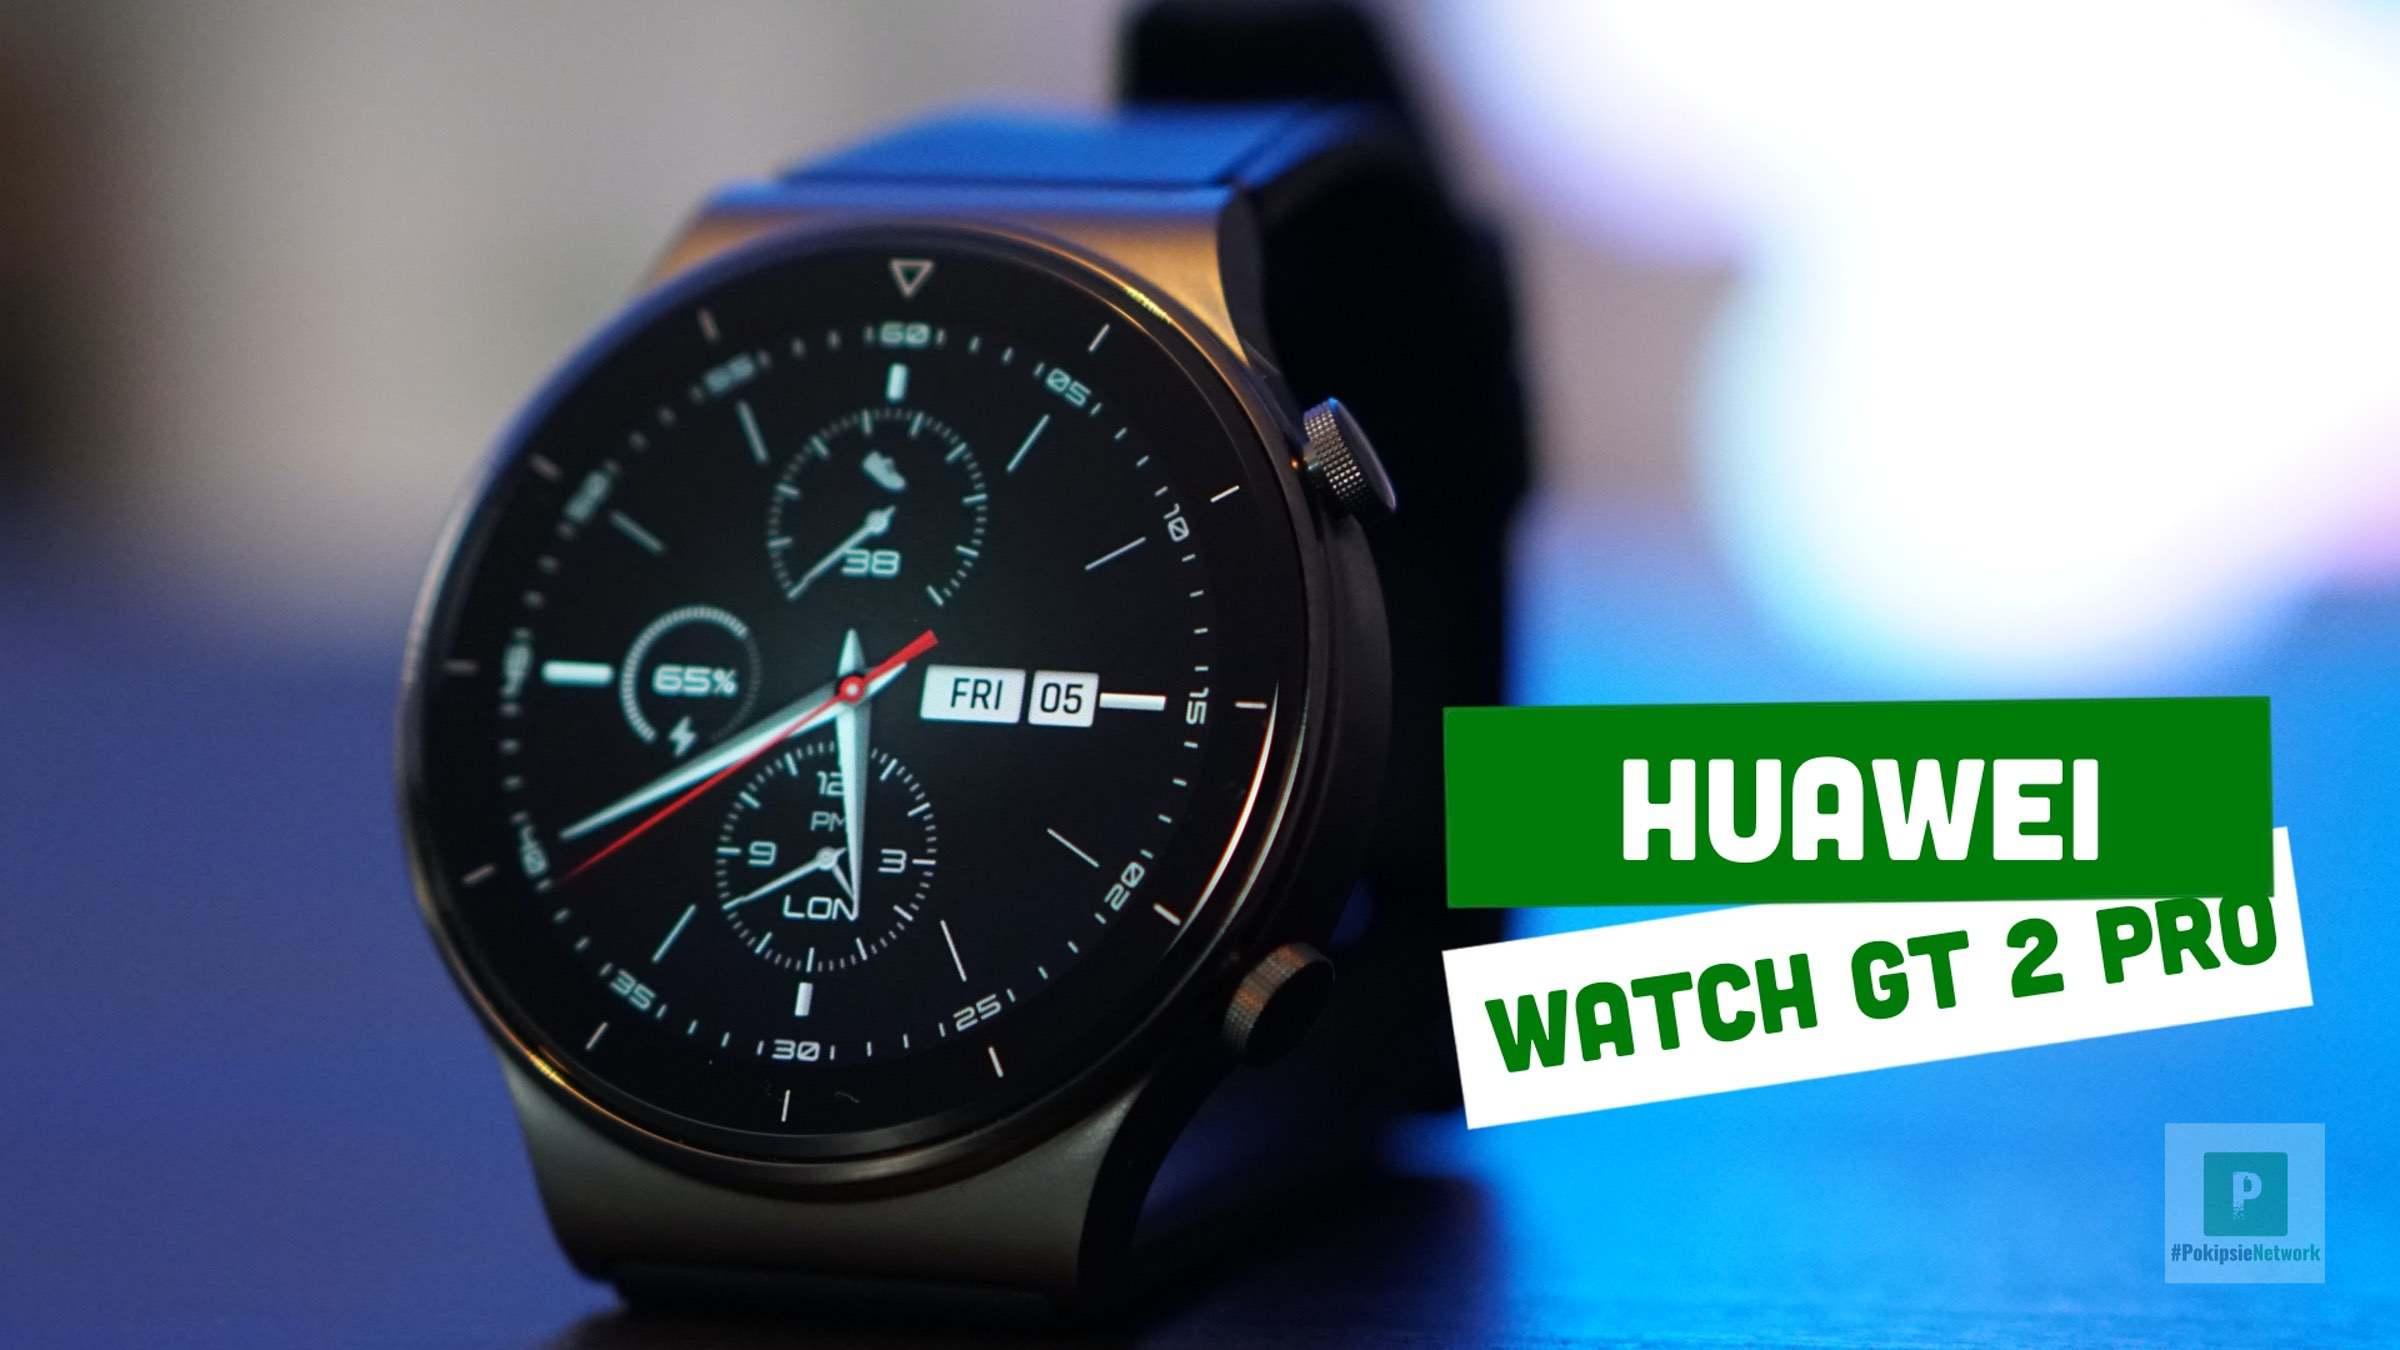 Video – Huawei Watch GT 2 Pro